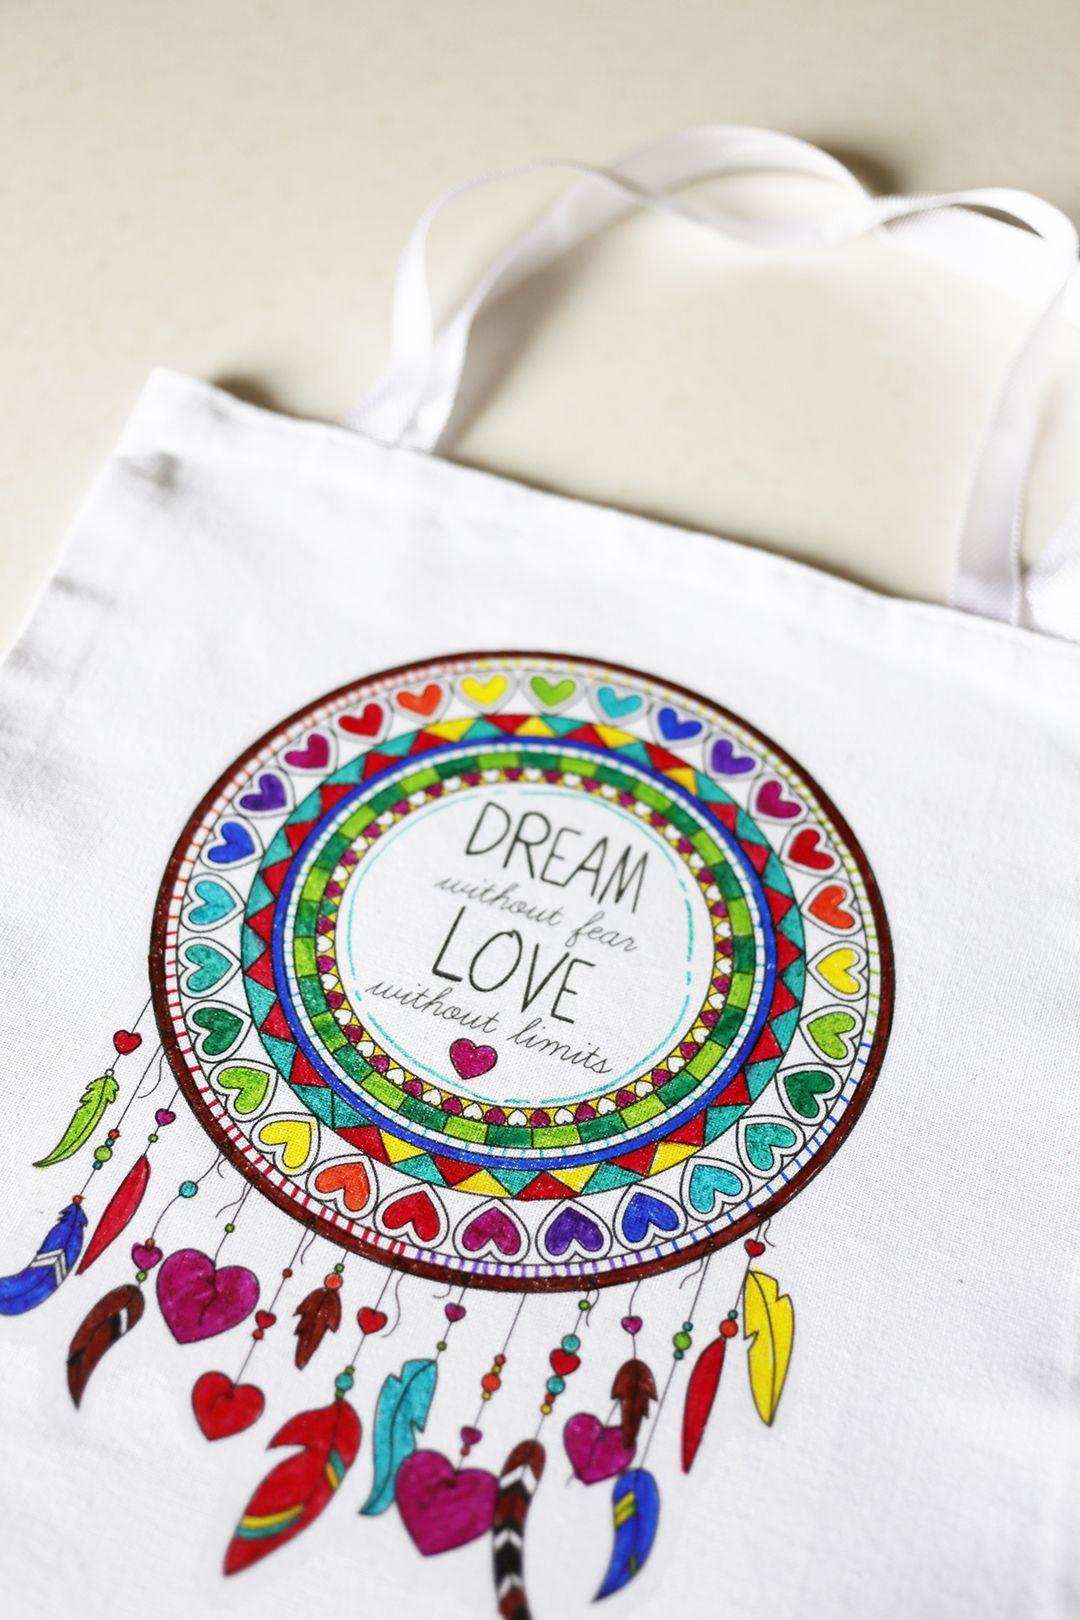 Dreamcatcher Diy Coloring Book Canvas Bag Art Bag Diy Arts And Crafts Arts And Crafts